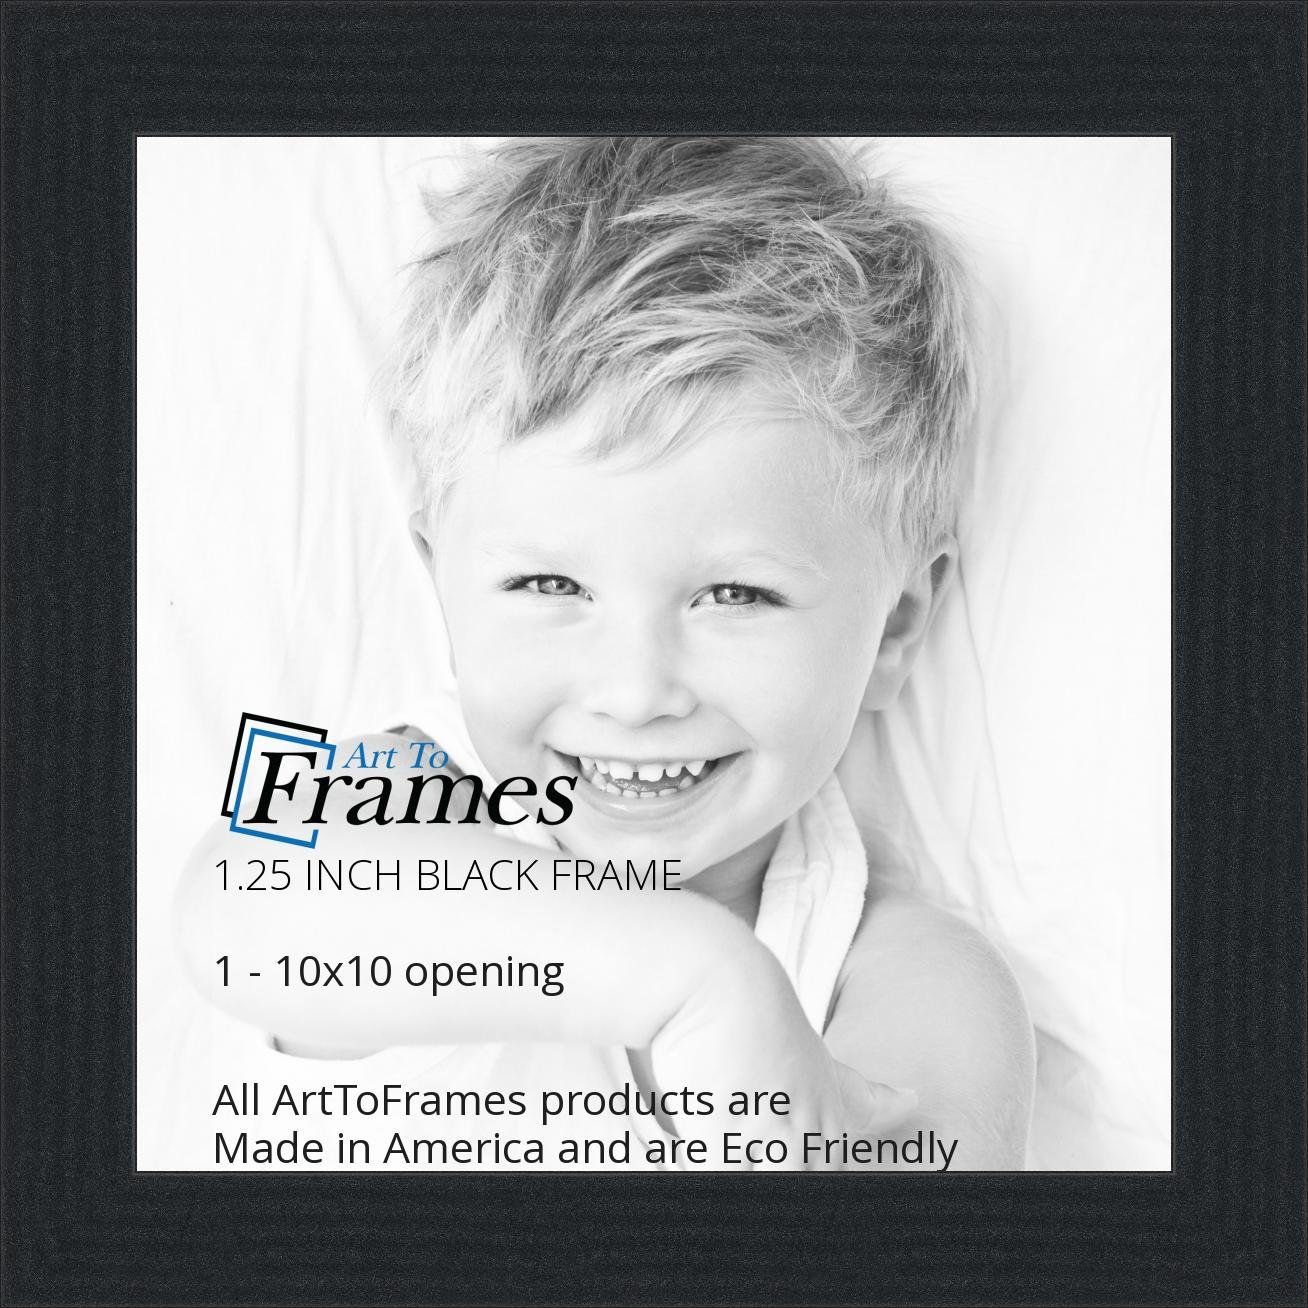 amazoncom arttoframes 10x10 inch black picture frame womfrbw72079 10x10 single frames